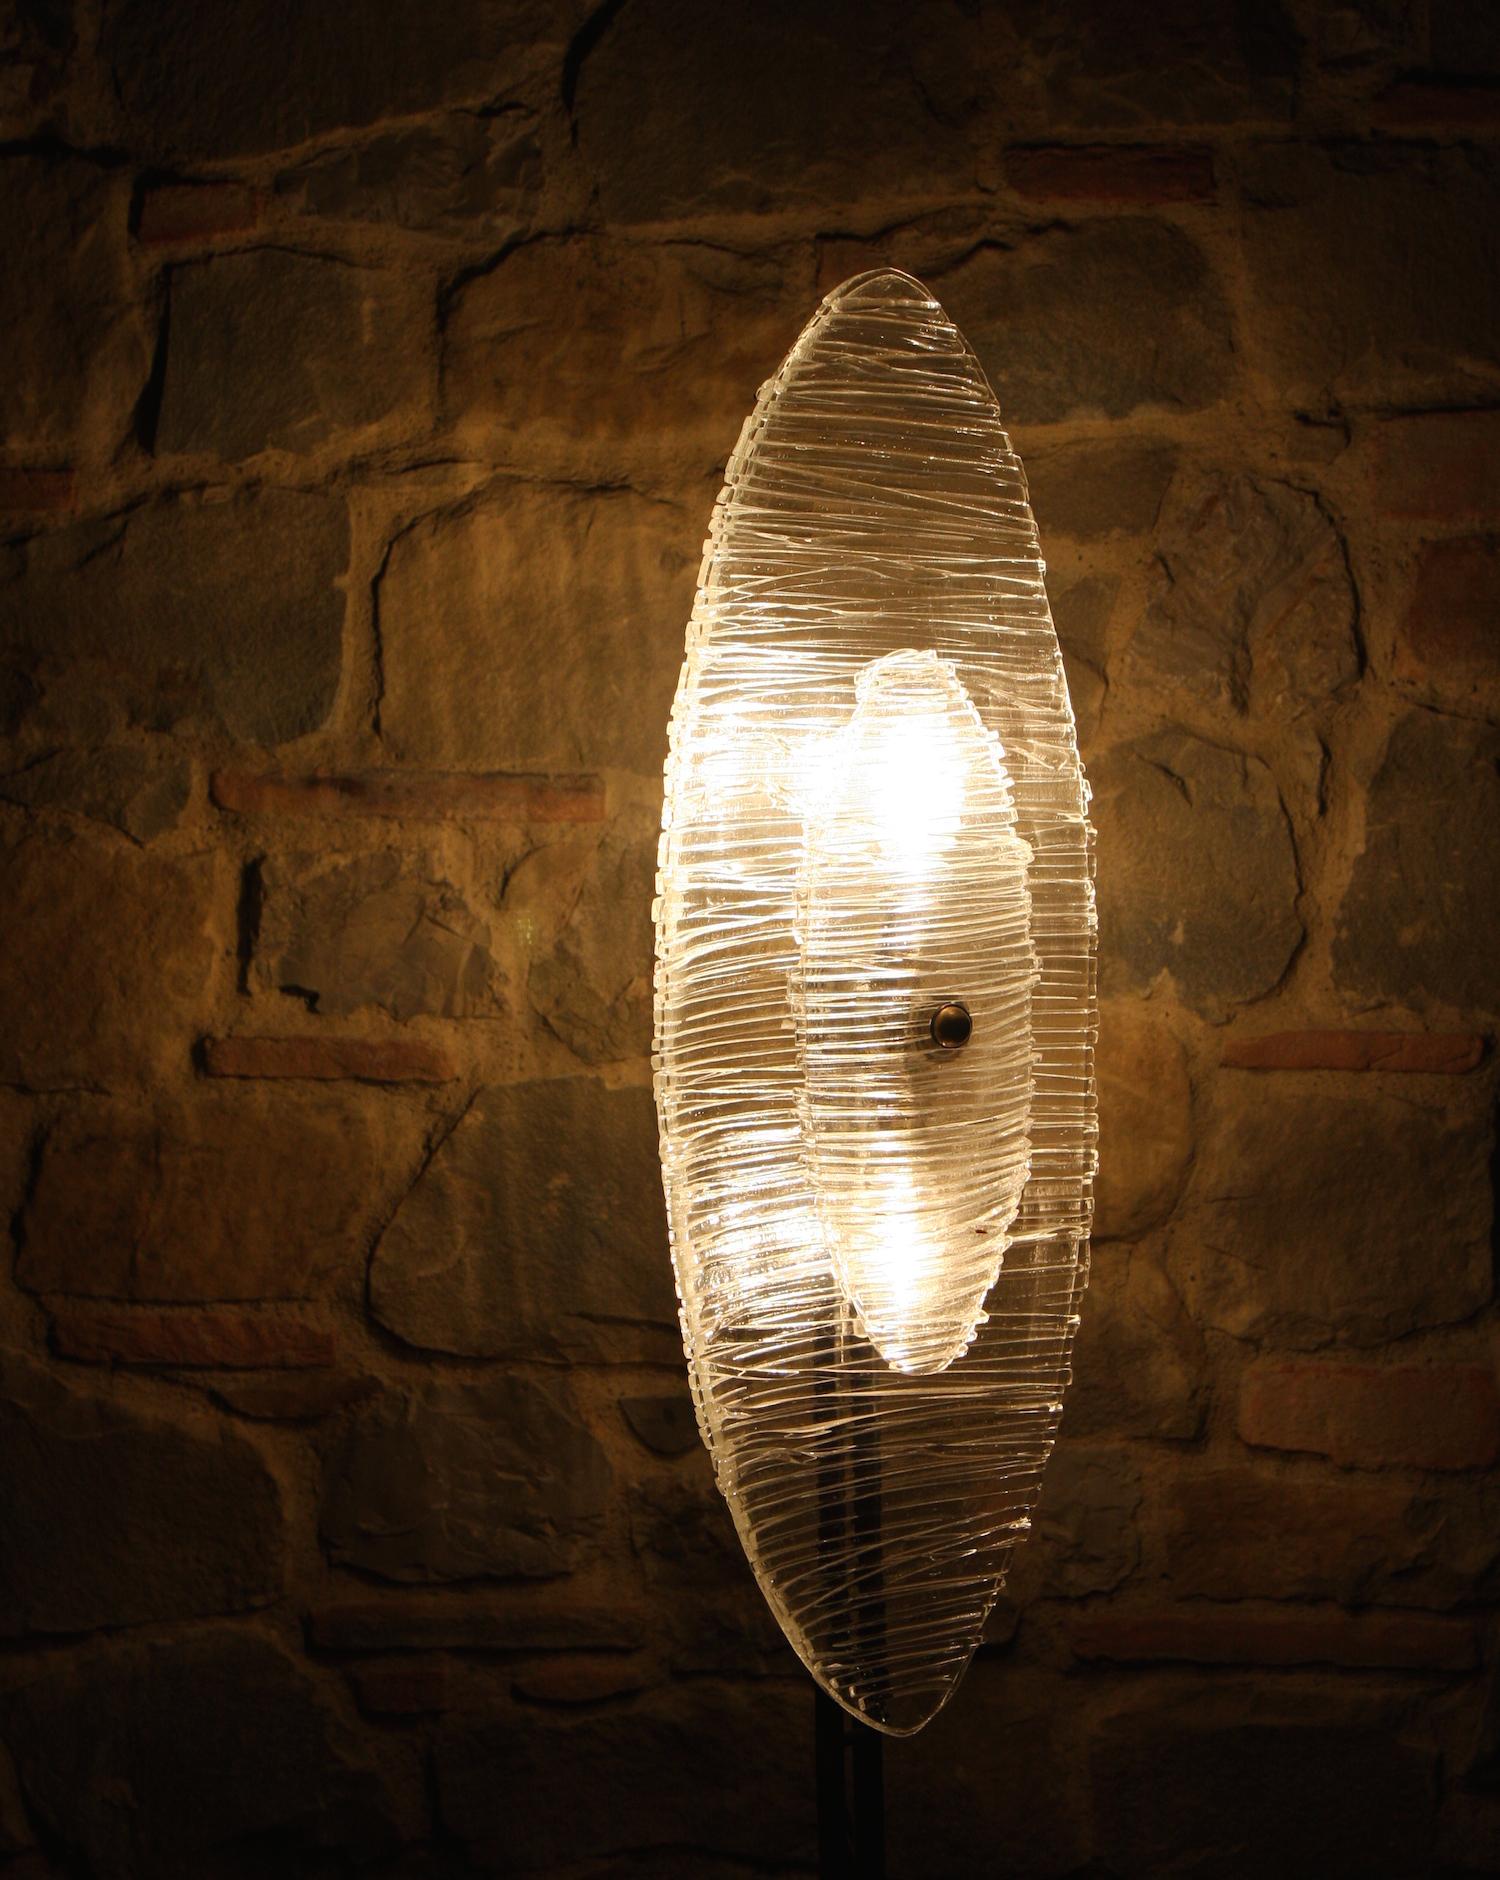 Floor glass lamp by Studiosilice